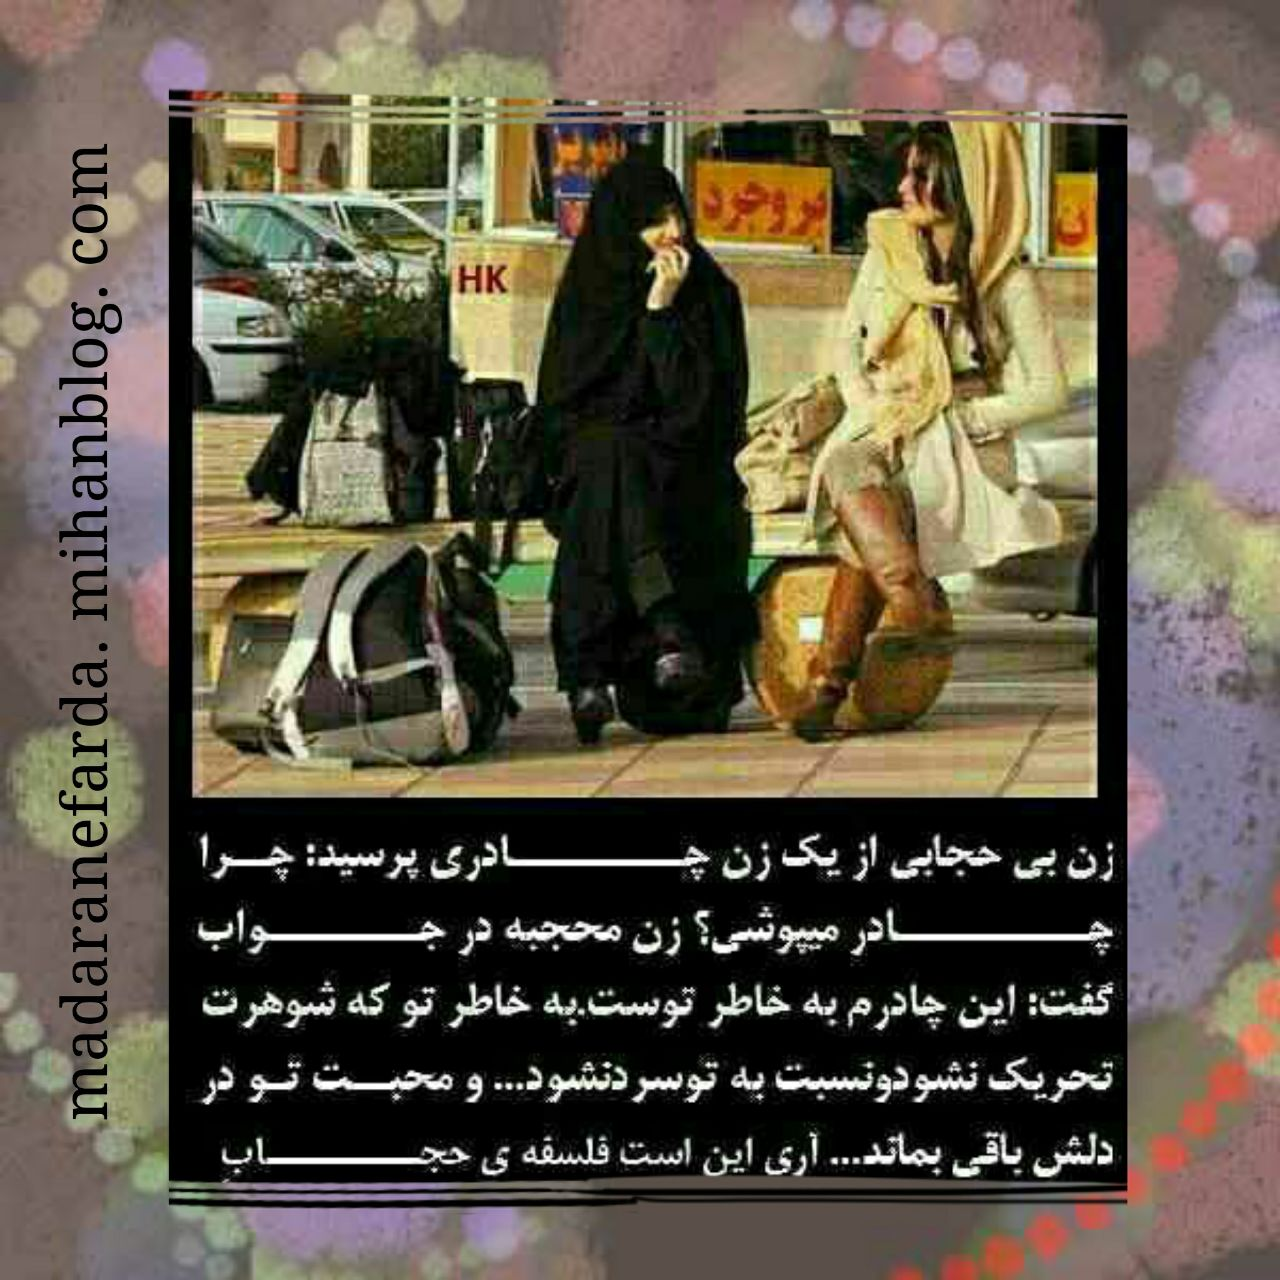 http://uupload.ir/files/q6g4_img_۲۰۱۵۰۵۱۴_۲۲۴۵۱۲.jpg